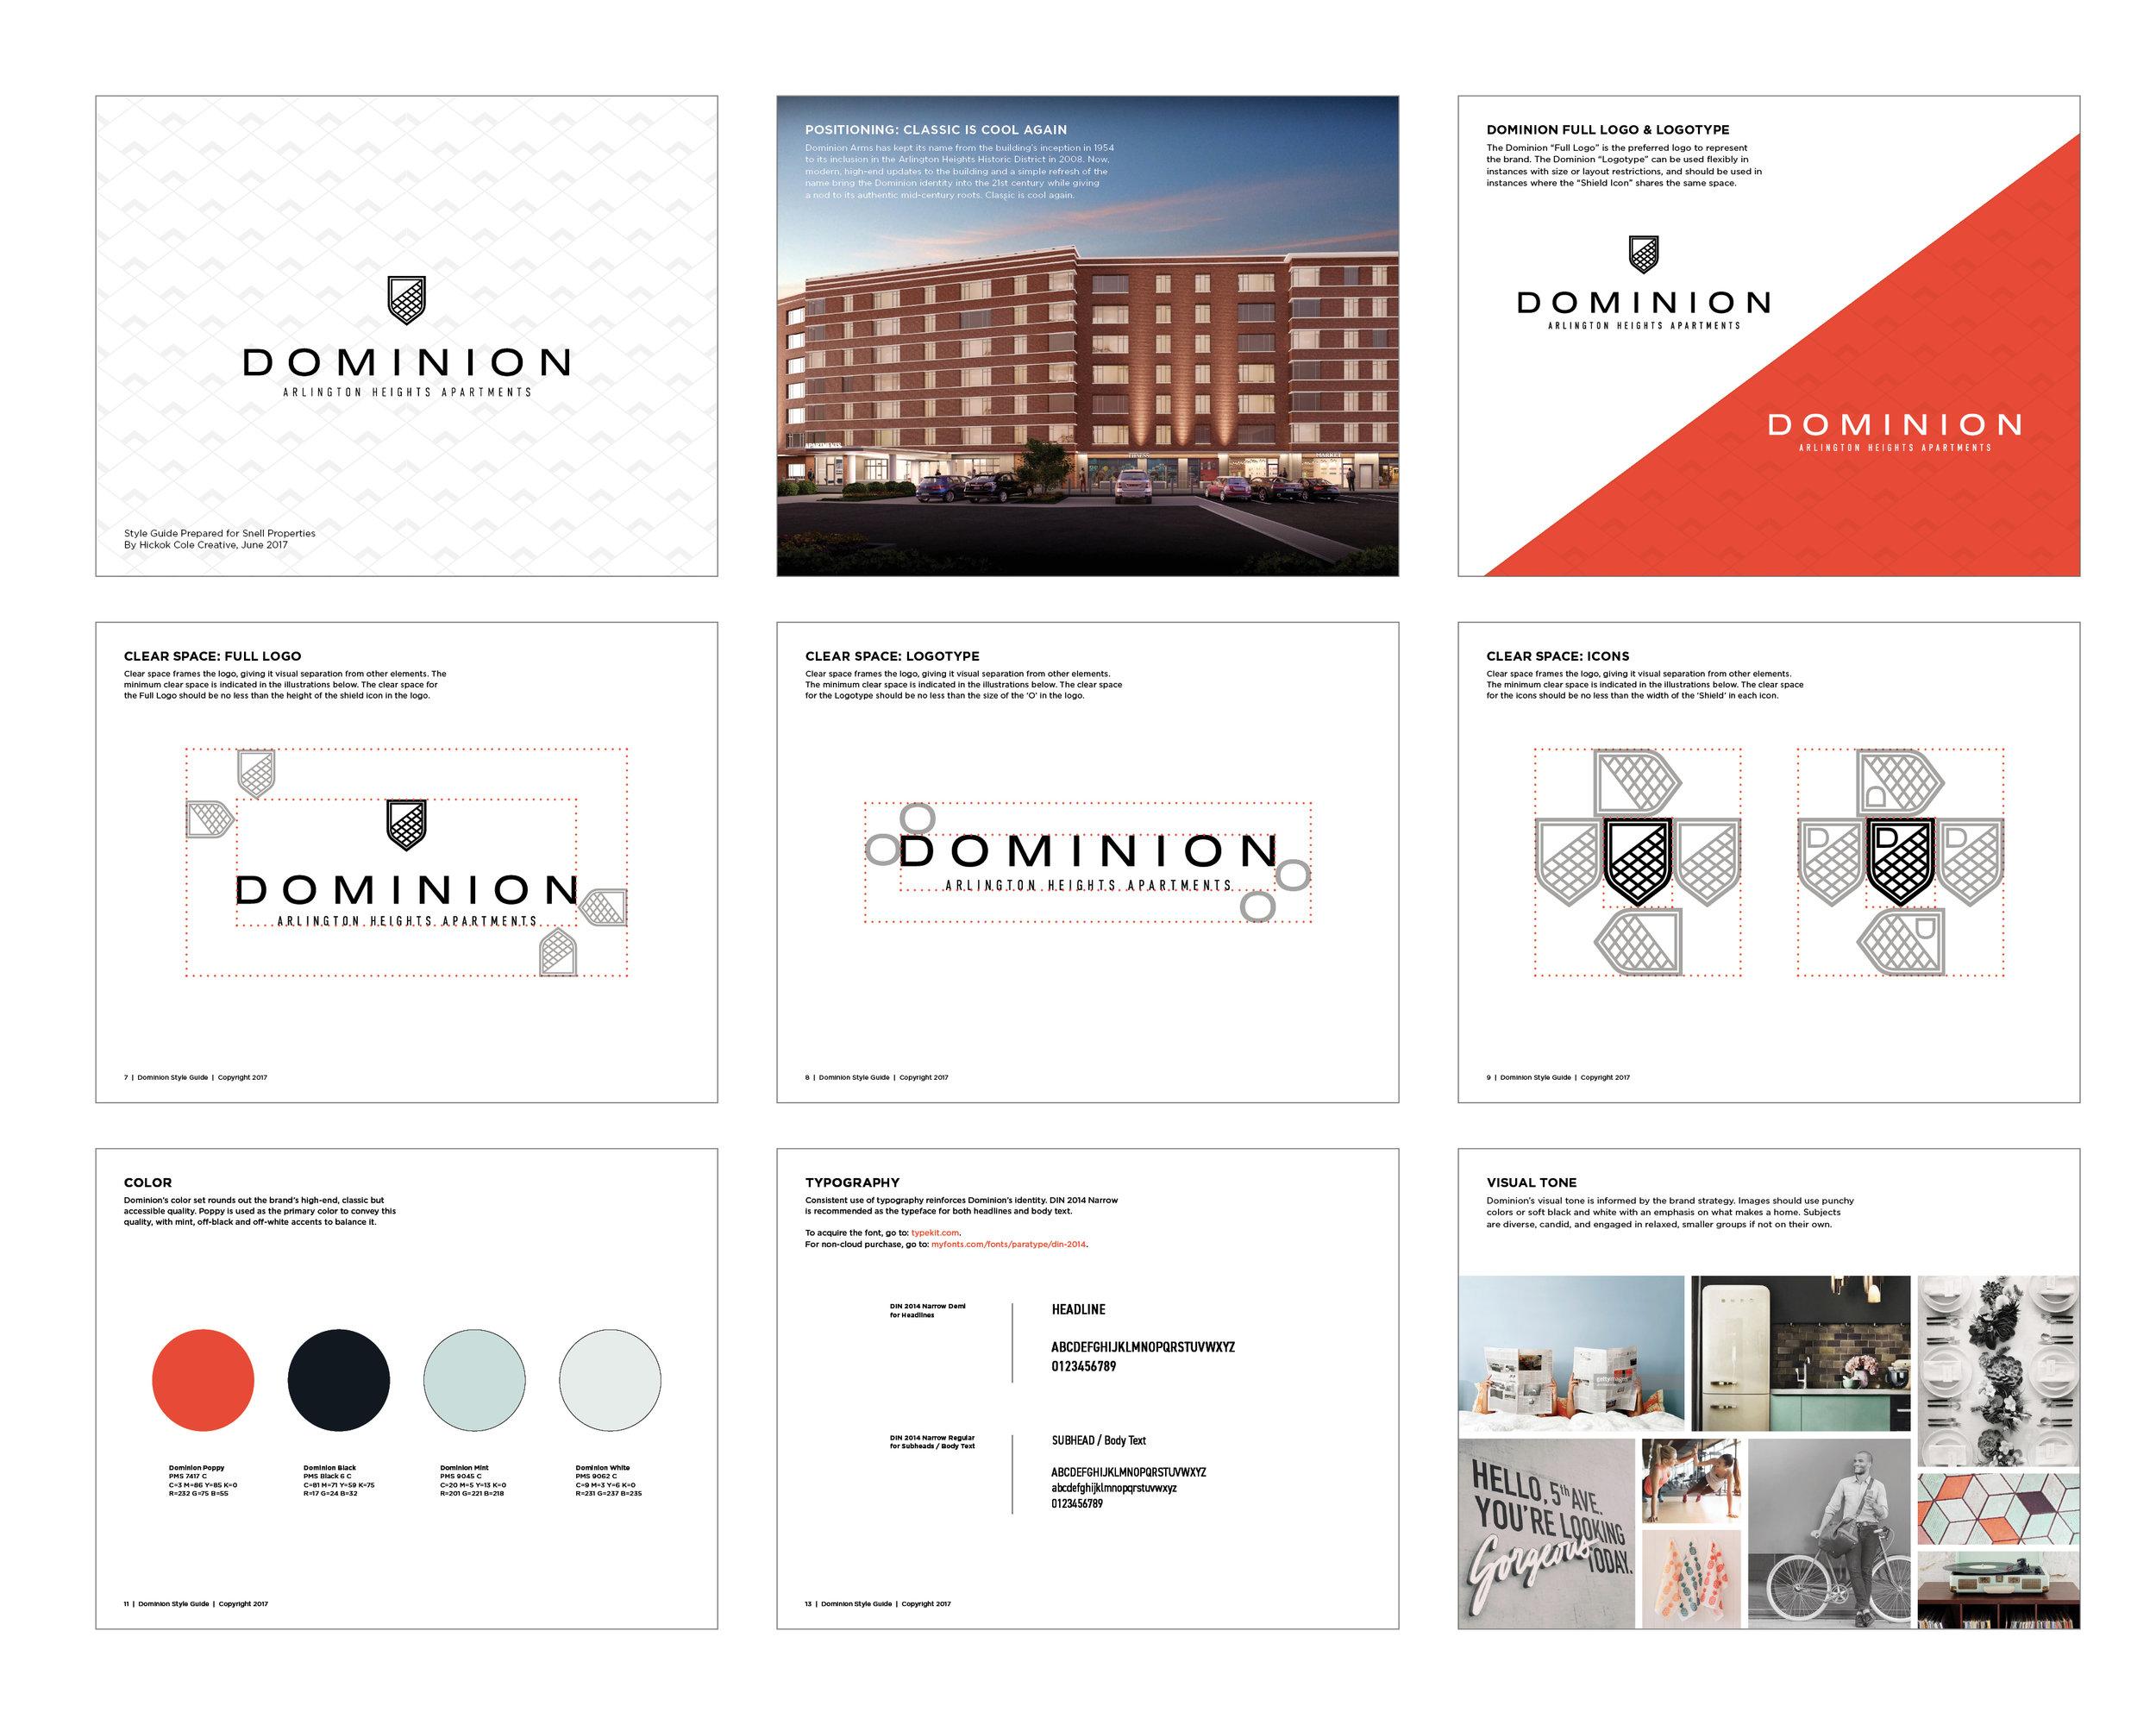 Dominion Branding Style Guide.jpg